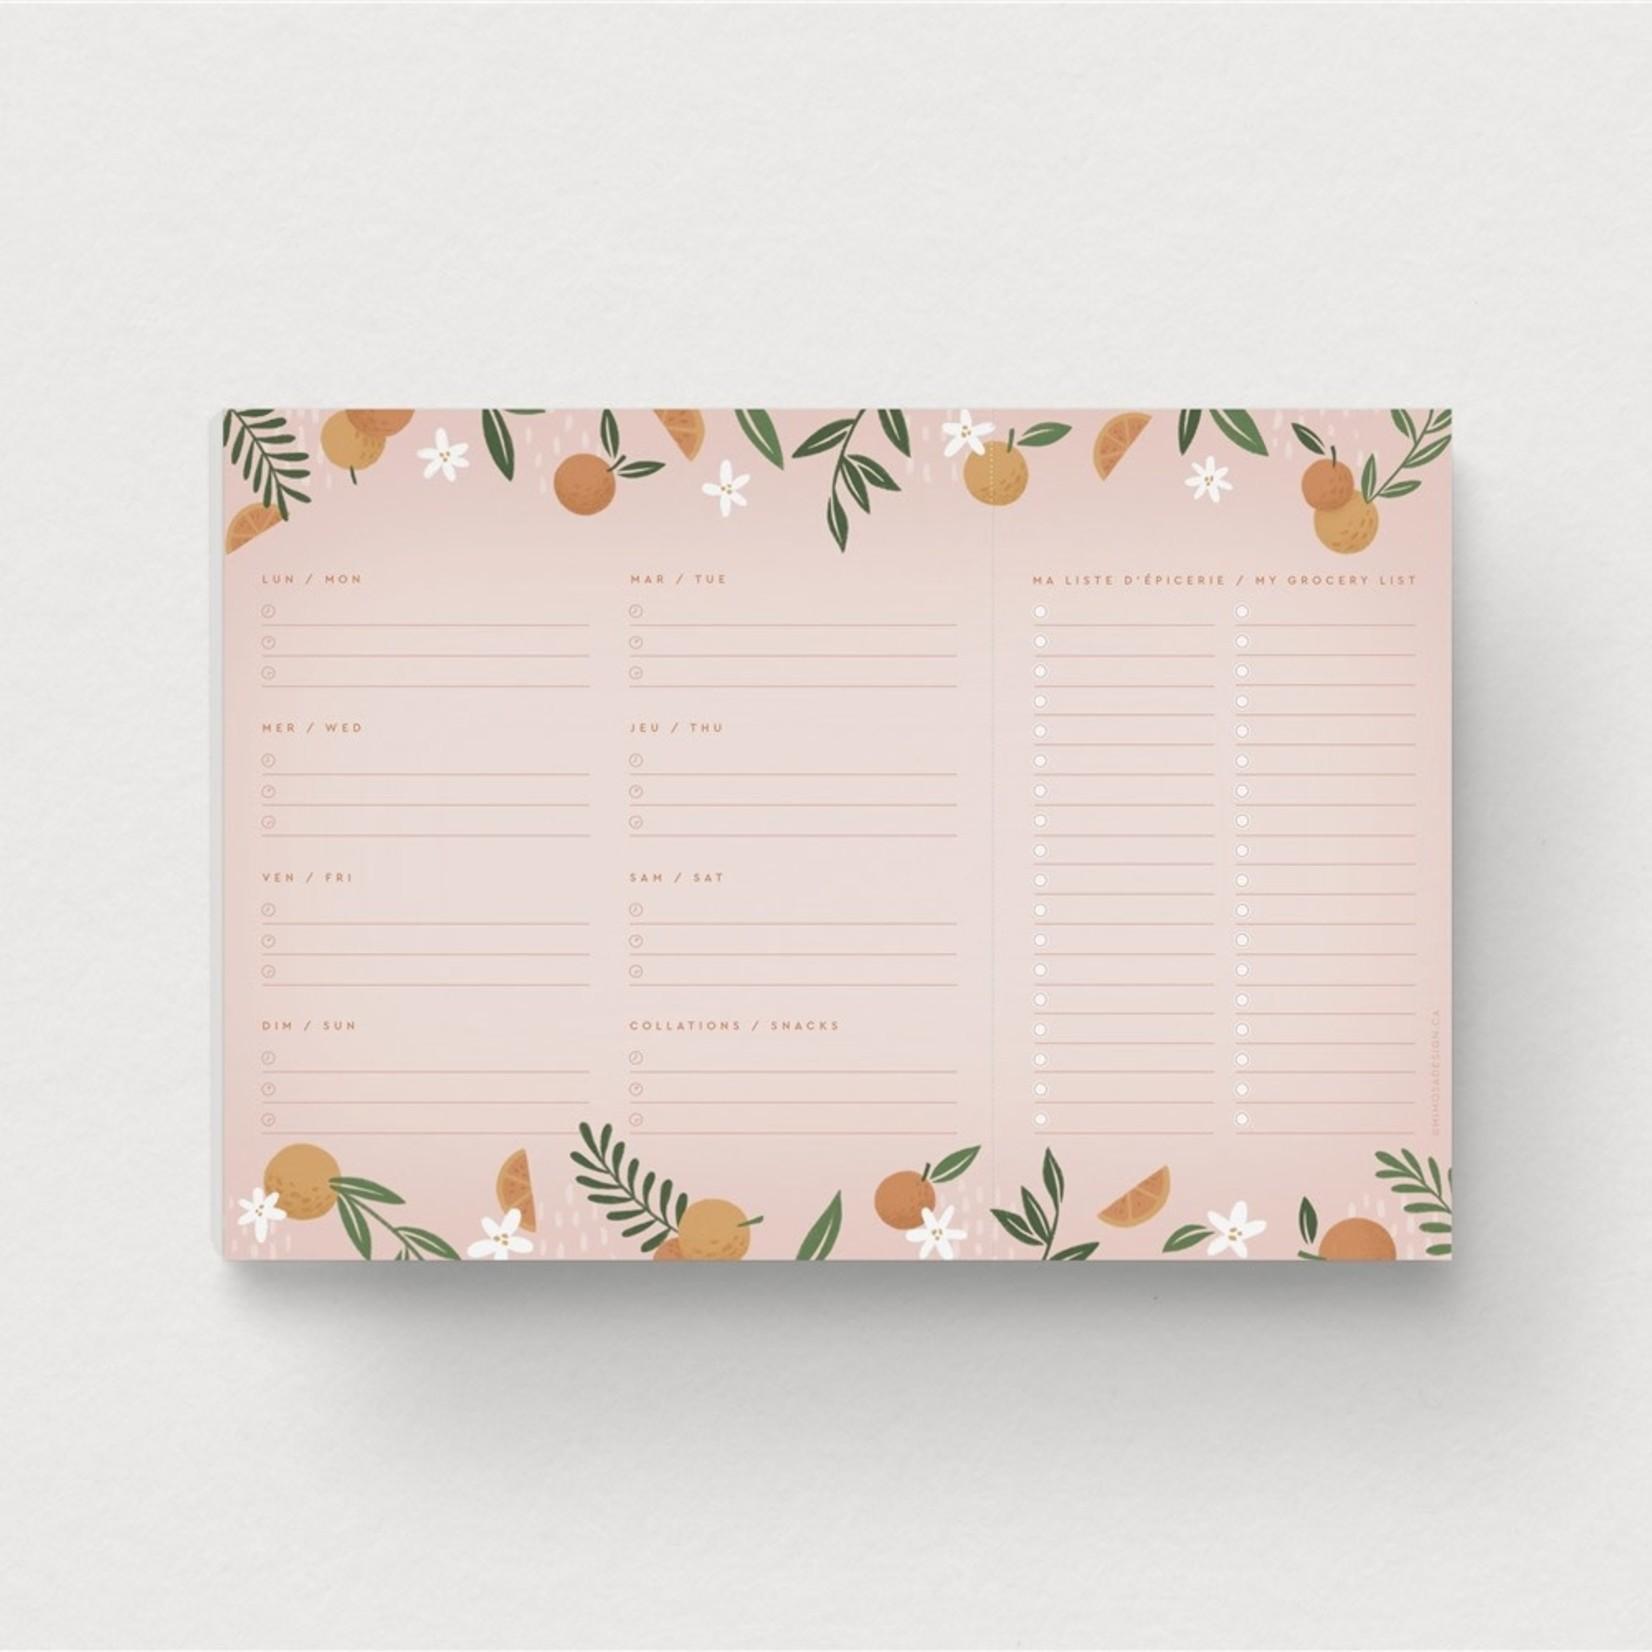 Mimosa Design Planificateur de repas - Mimosa